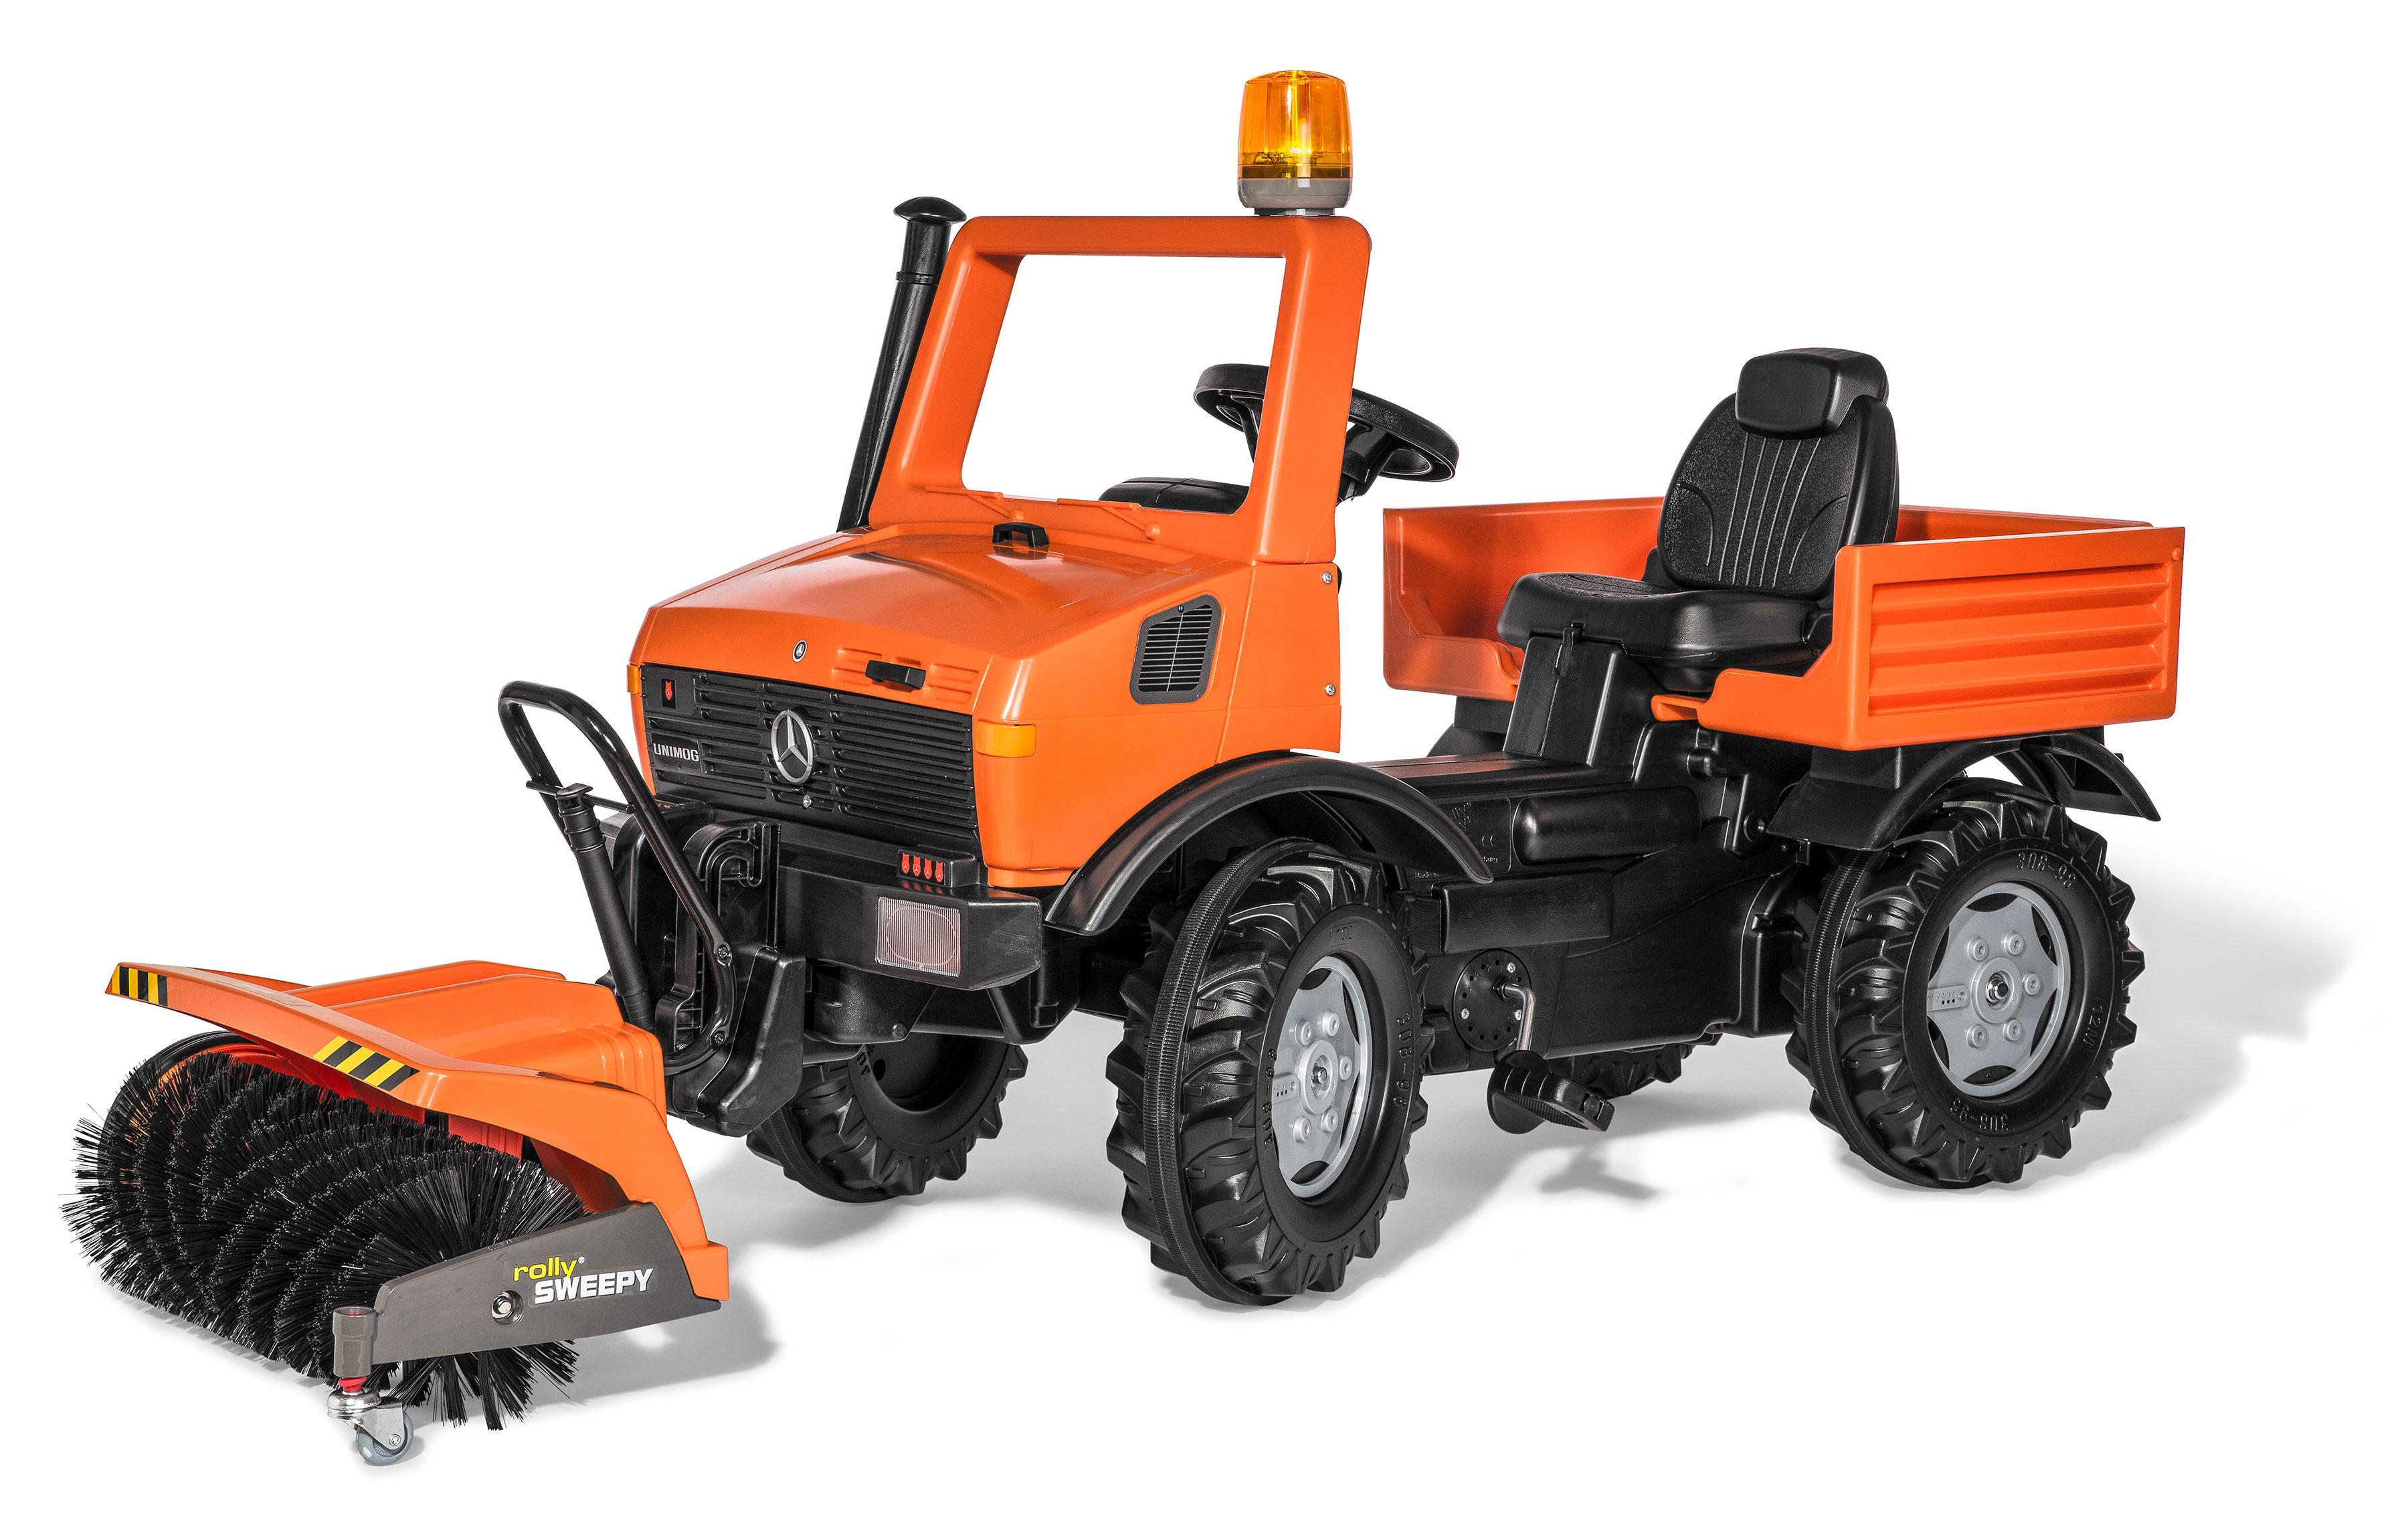 Tretfahrzeug rolly Unimog Service Sweepy Flashlight - Rolly Toys Bild 2